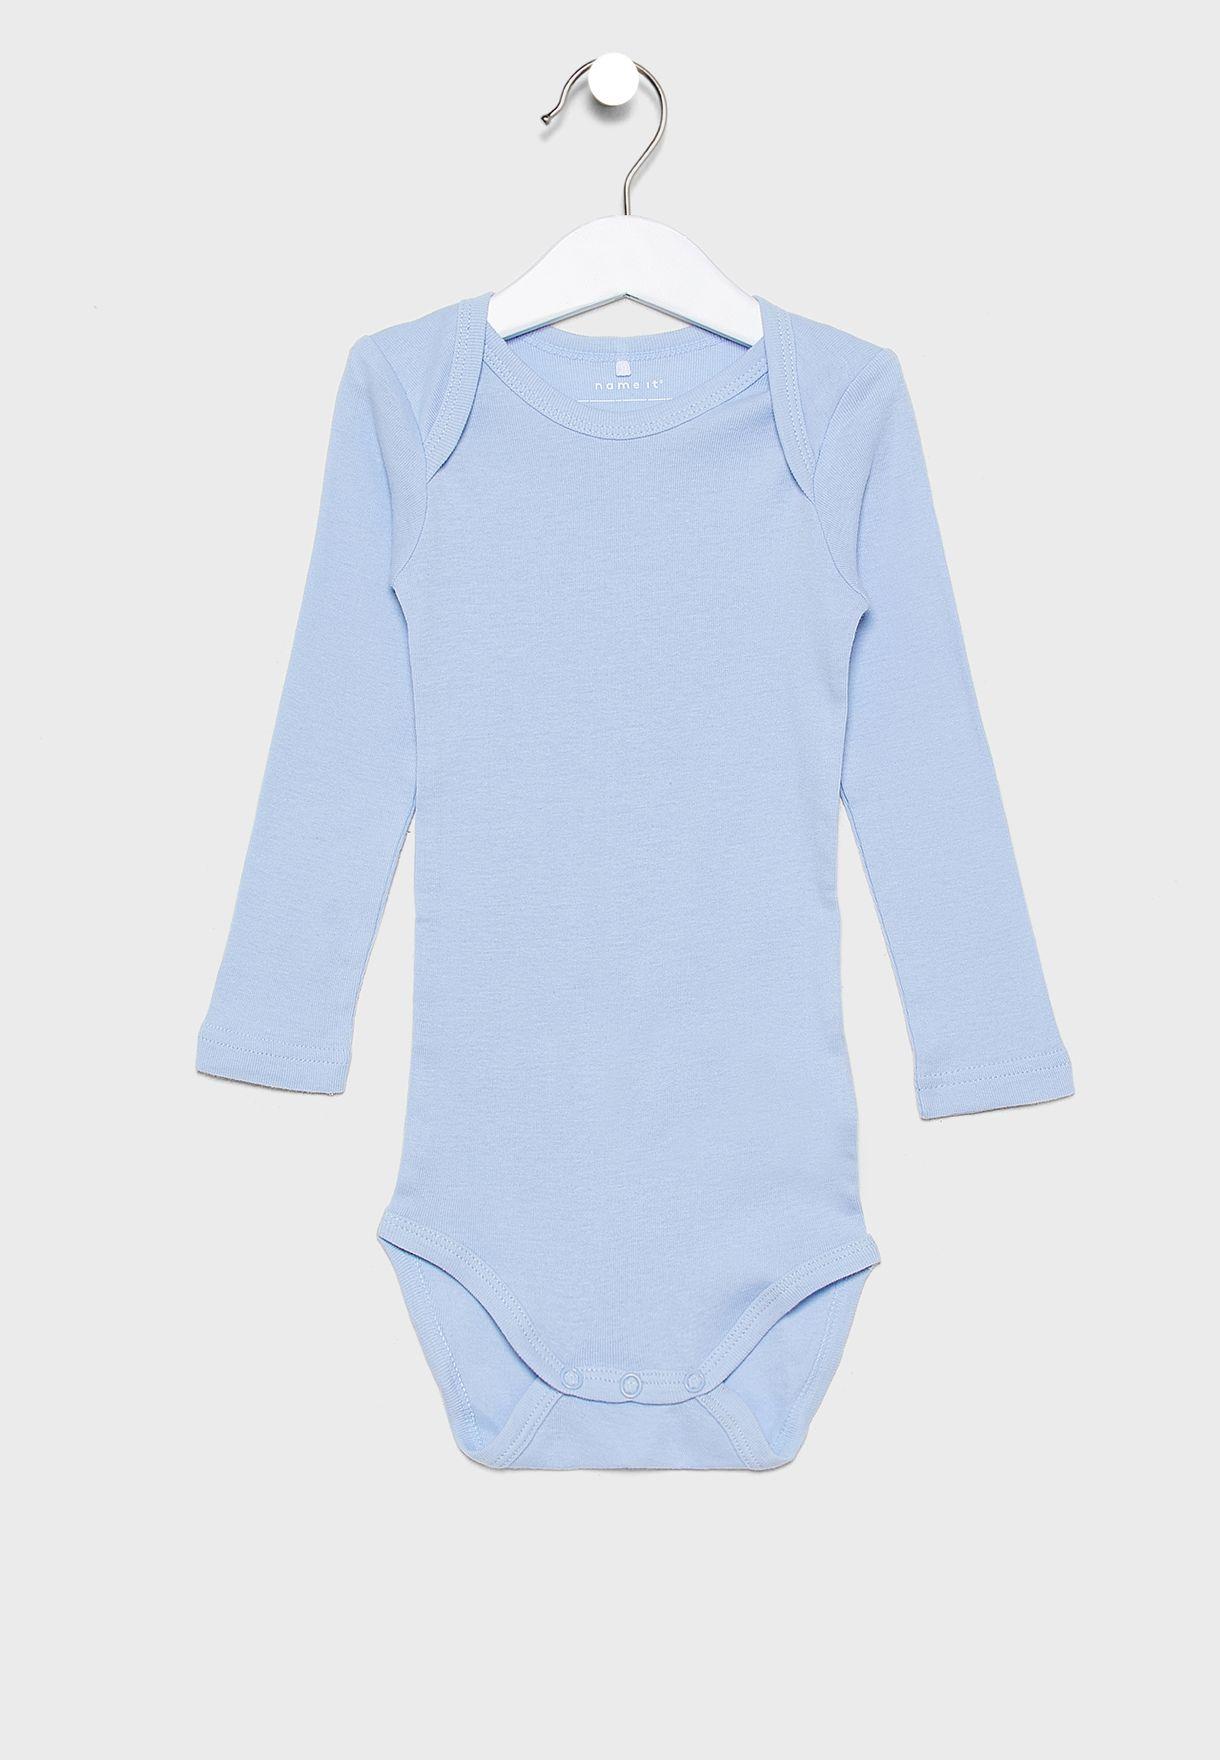 Infant 3 Pack Graphic Bodysuit